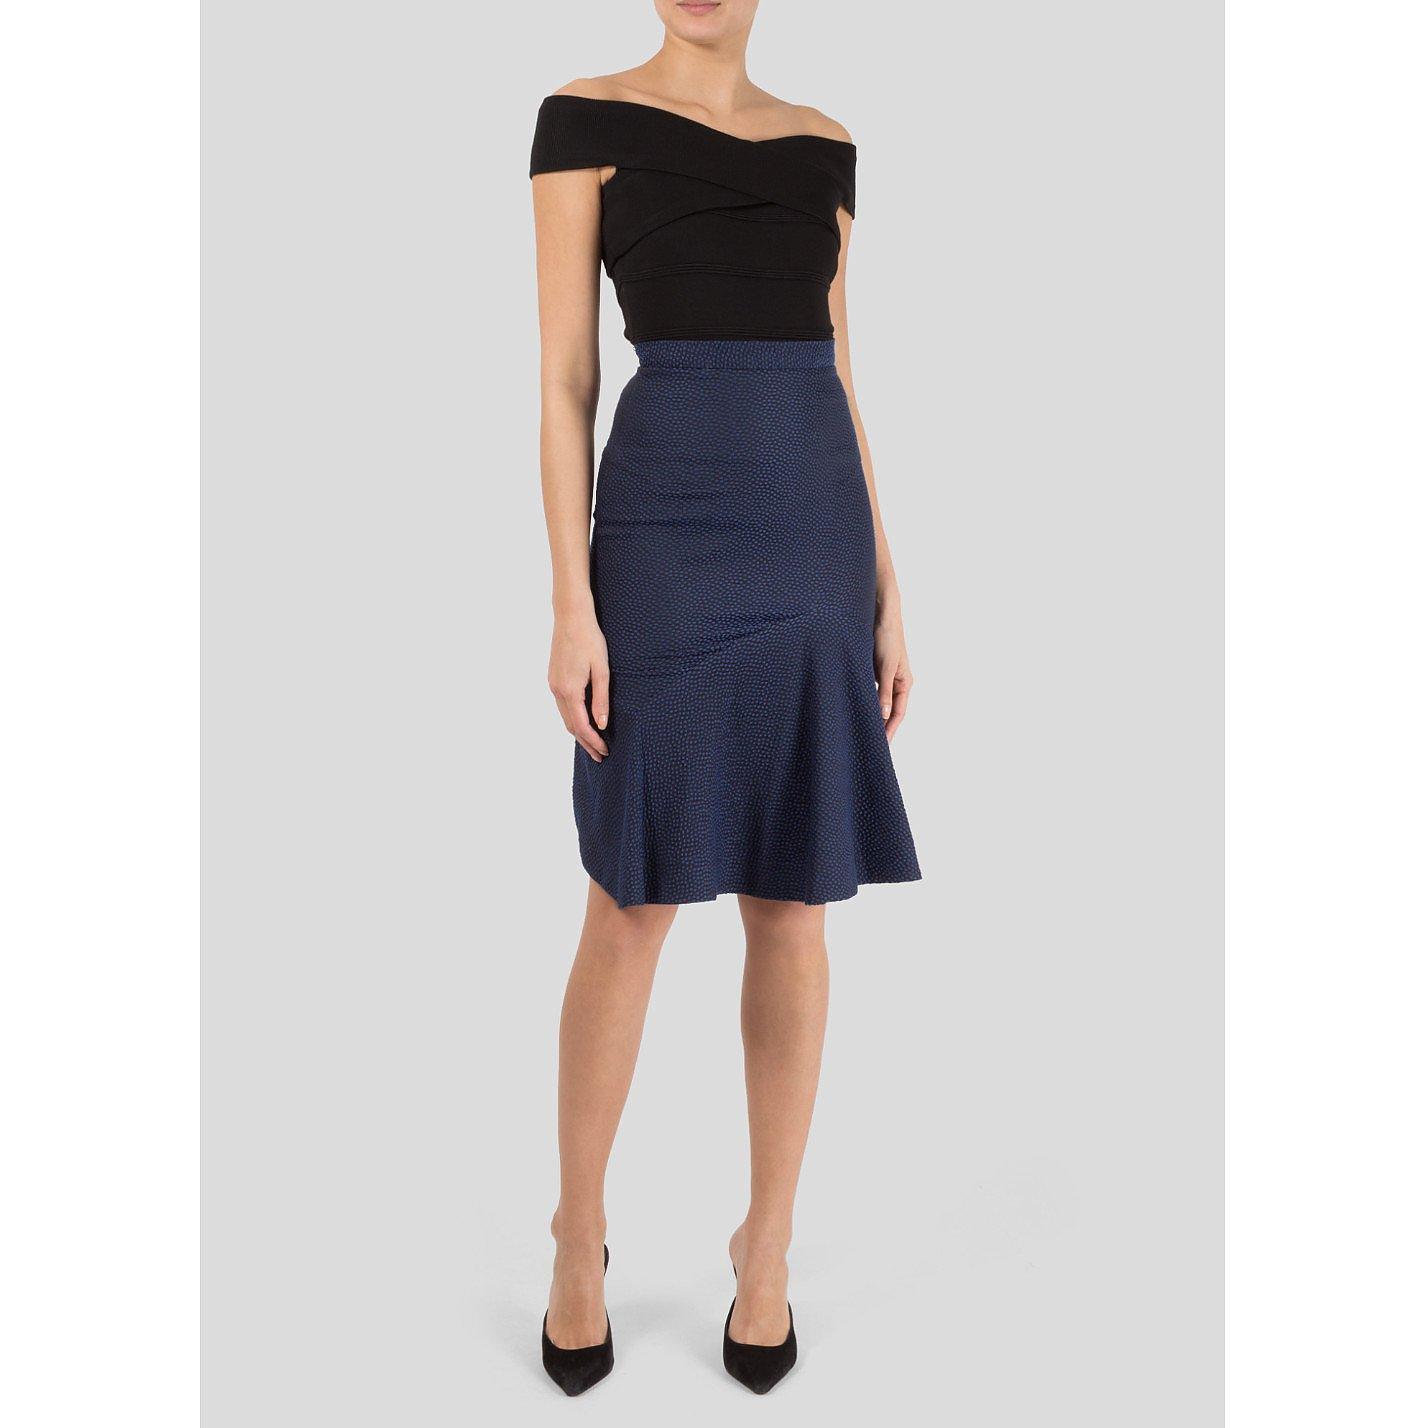 Roland Mouret High Waist Skirt with Fishtail Hem